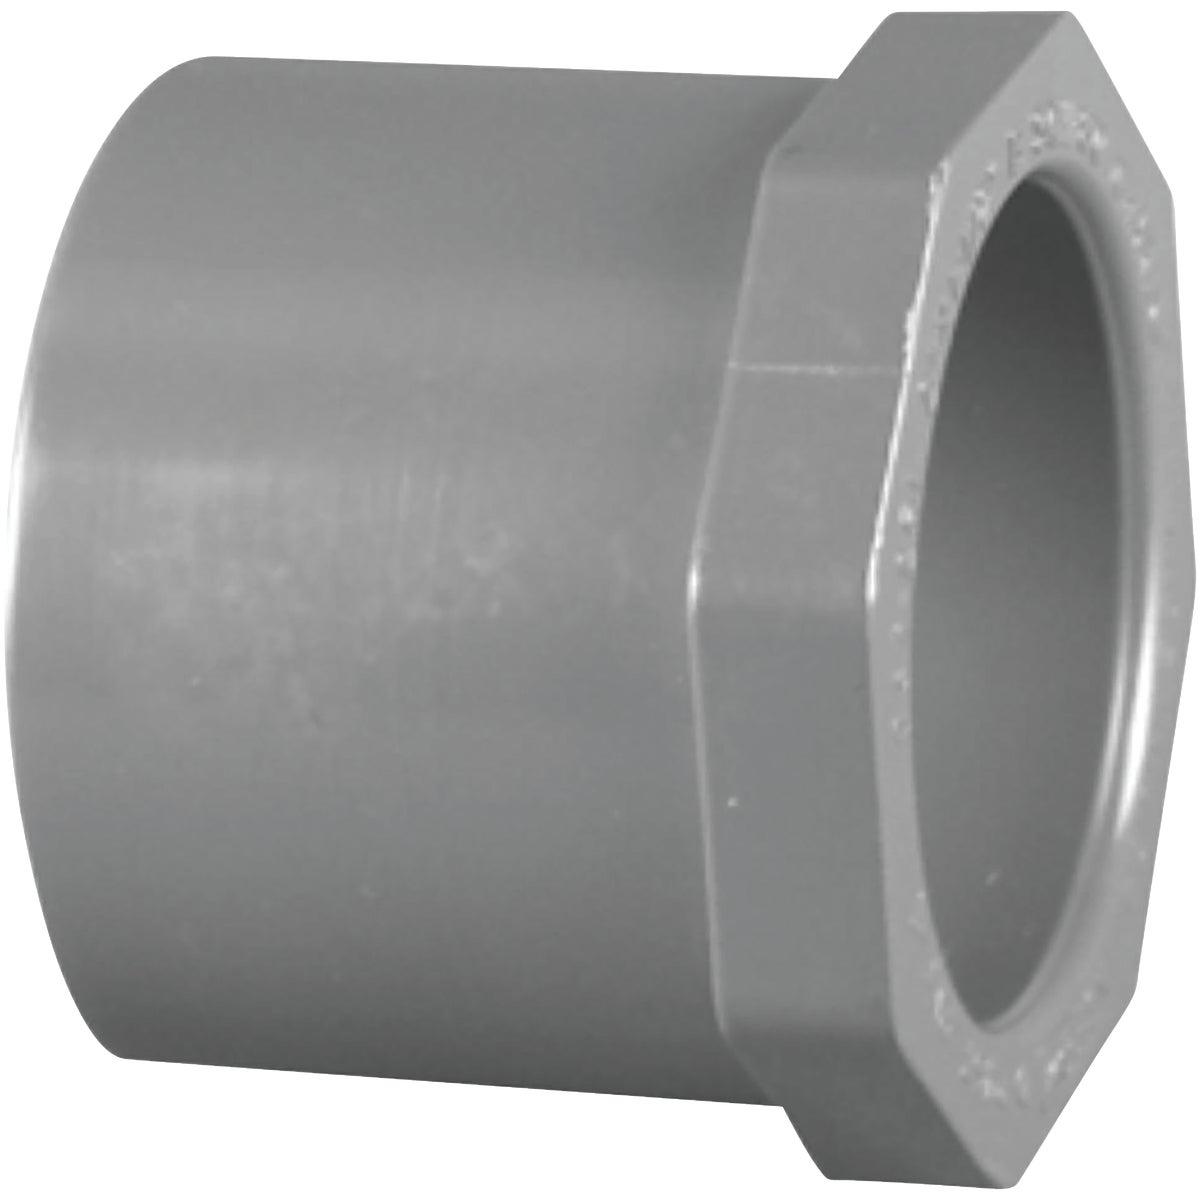 1-1/2X1 SPXS PVC BUSHING